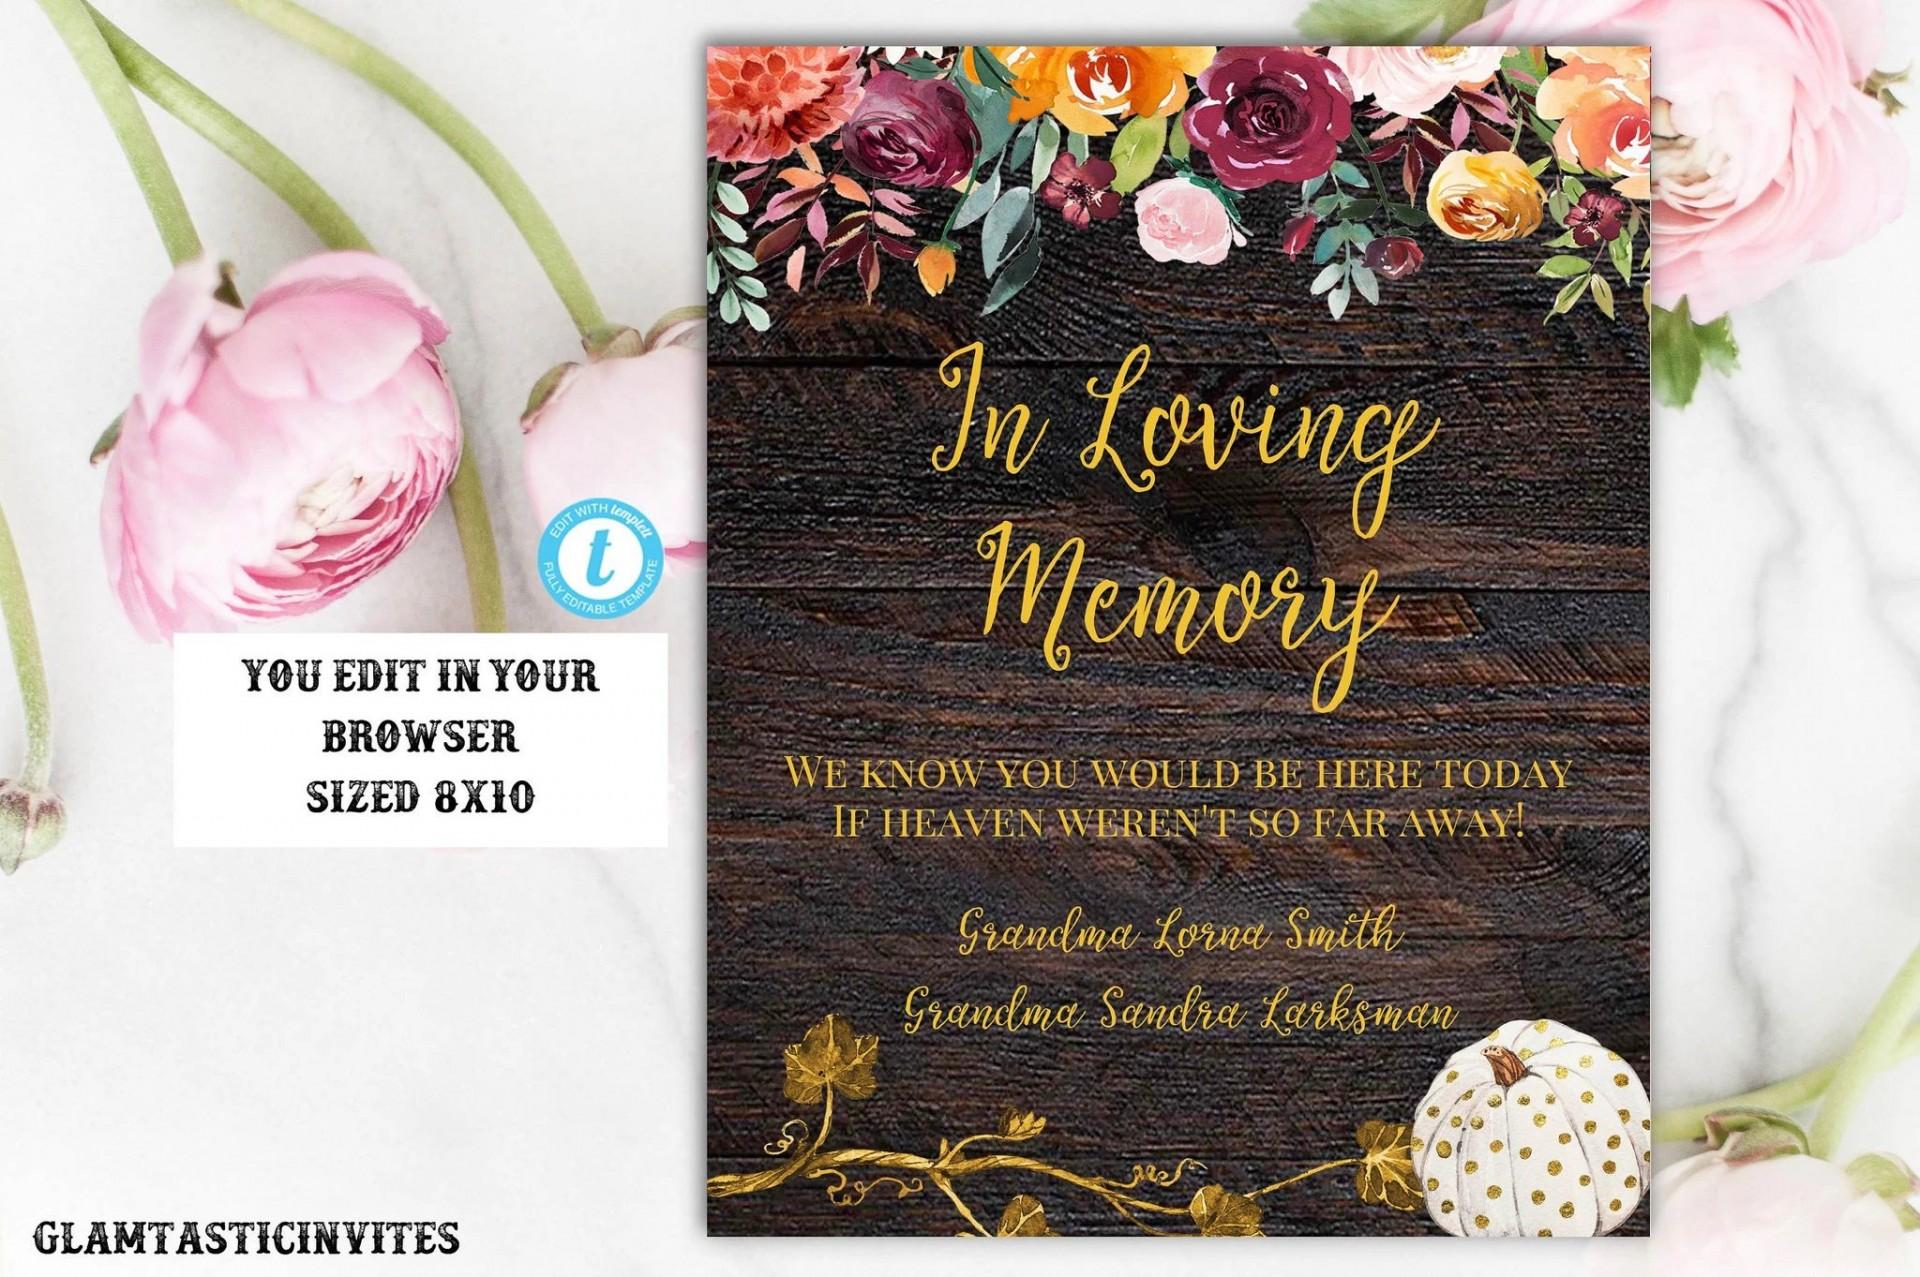 006 Simple In Loving Memory Template Image  Free Download Card Bookmark1920